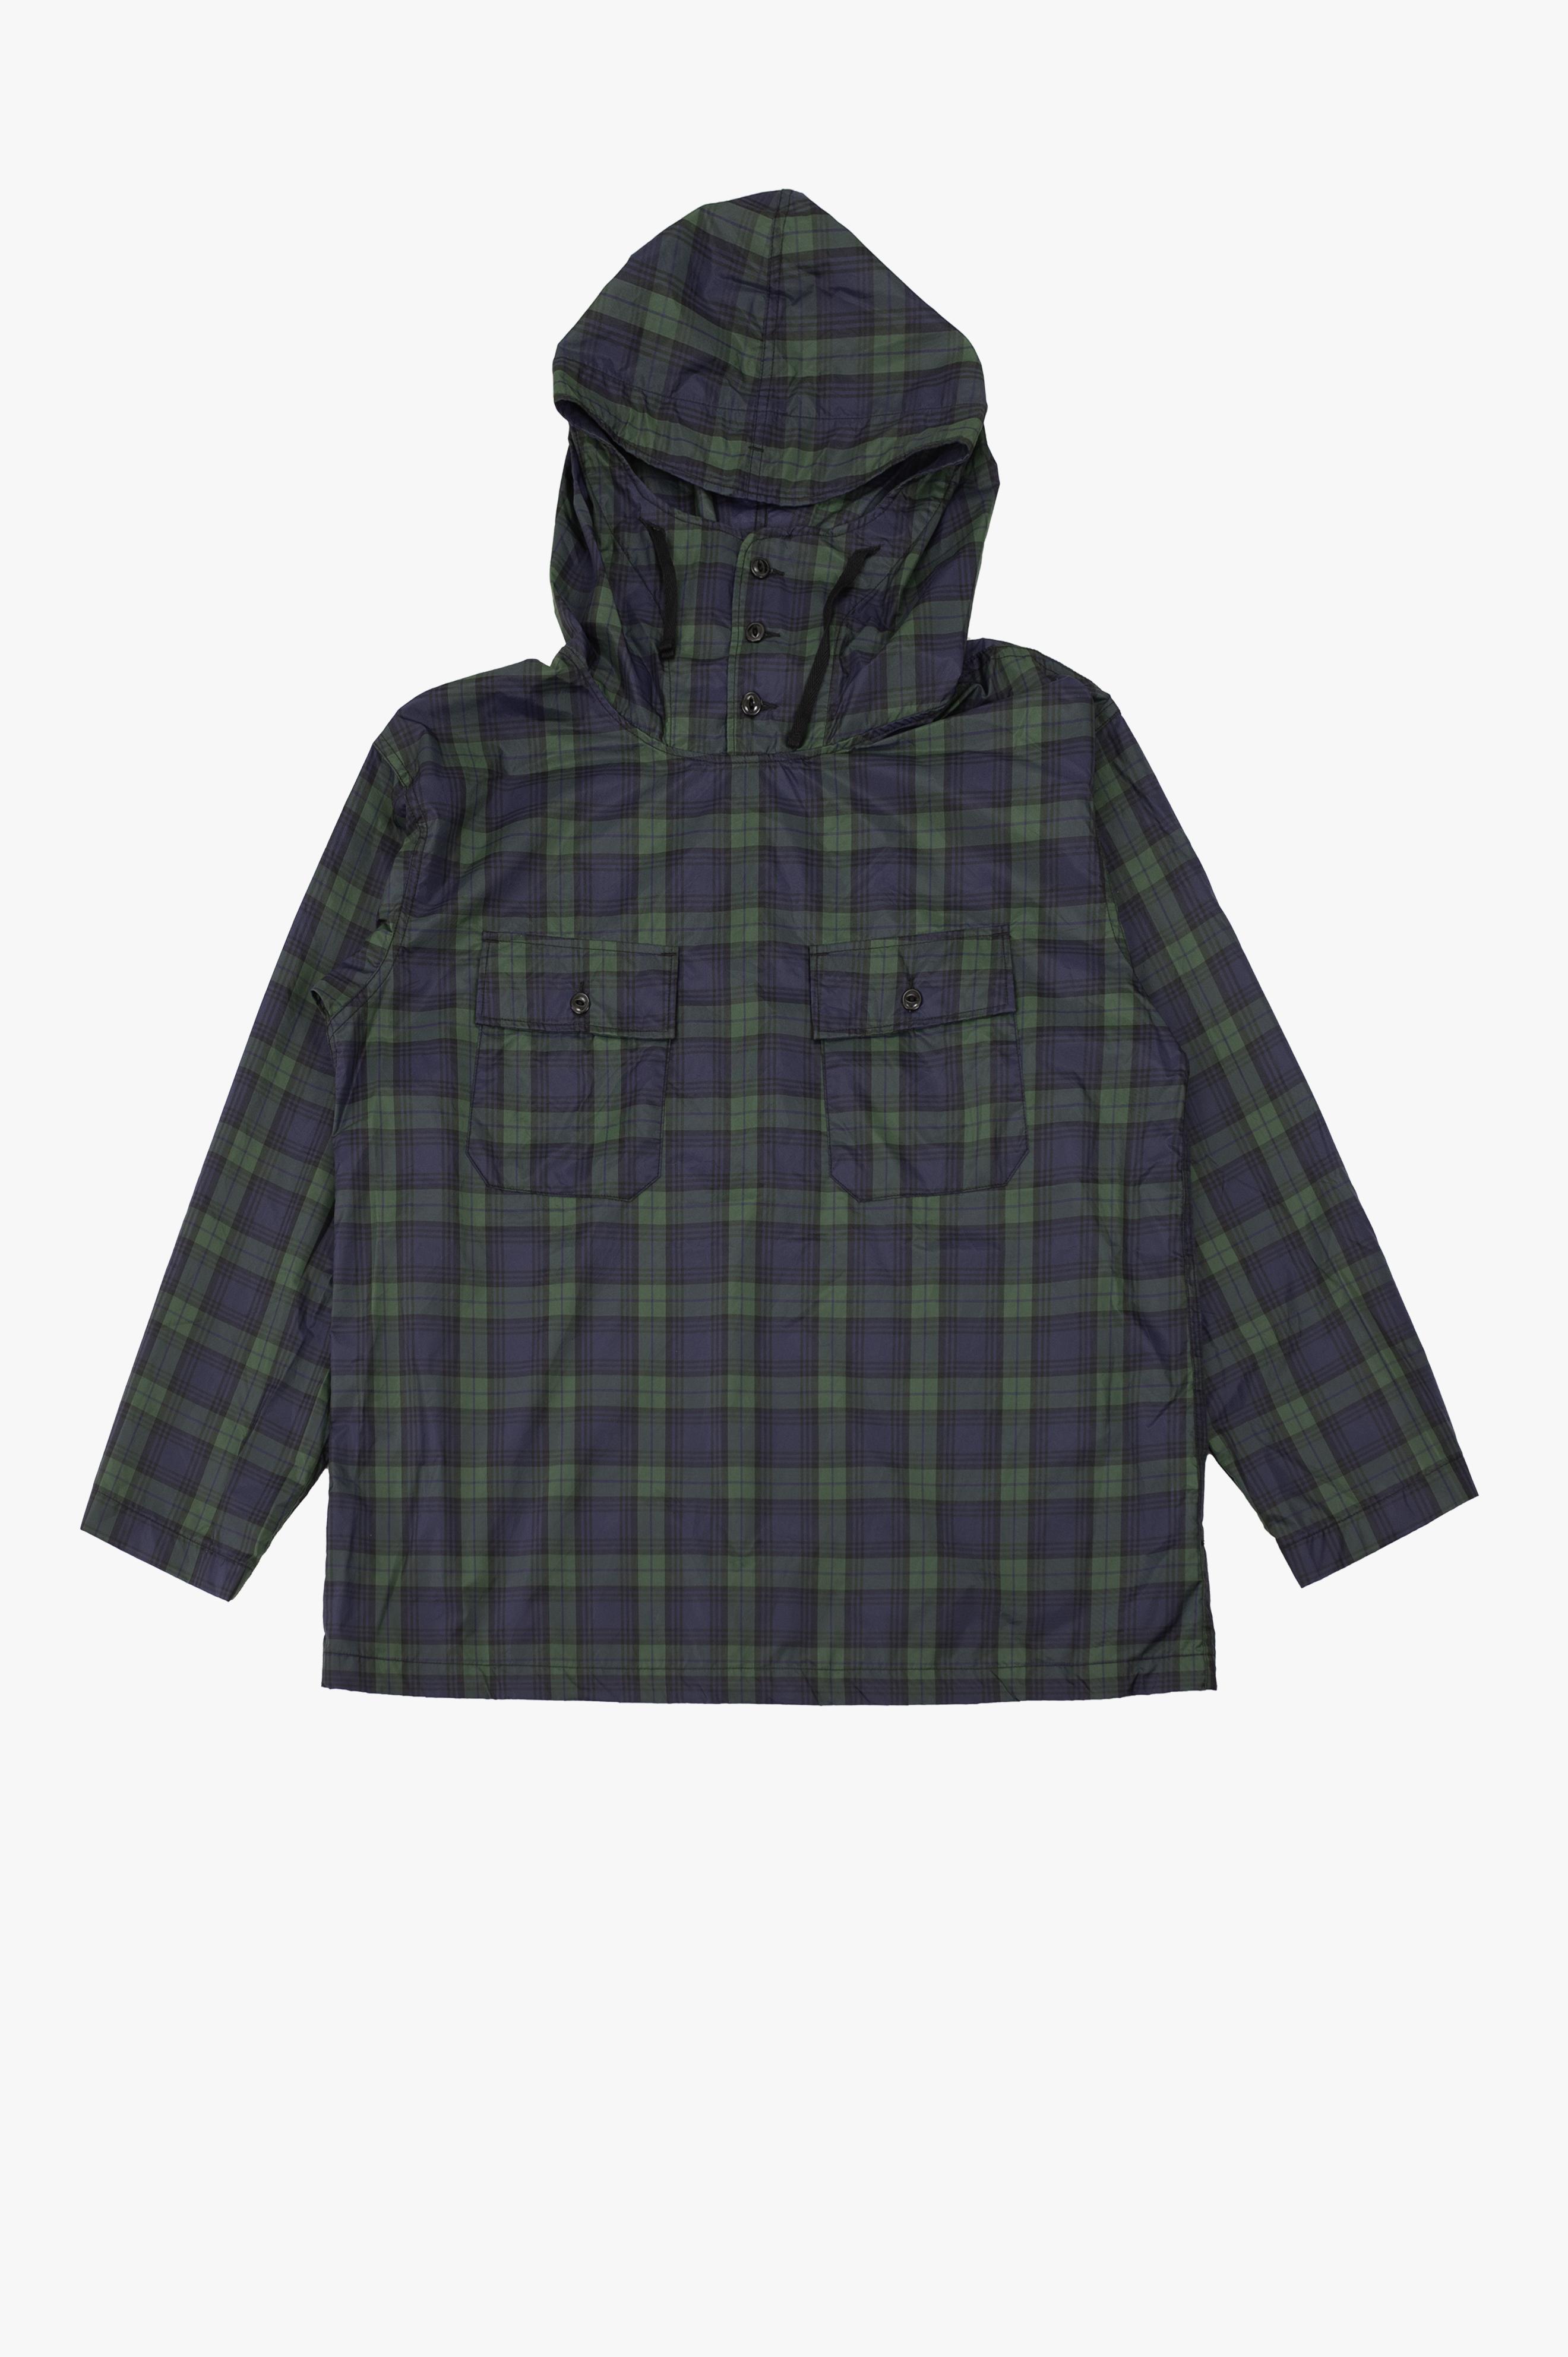 Cagoule Shirt Navy/Green